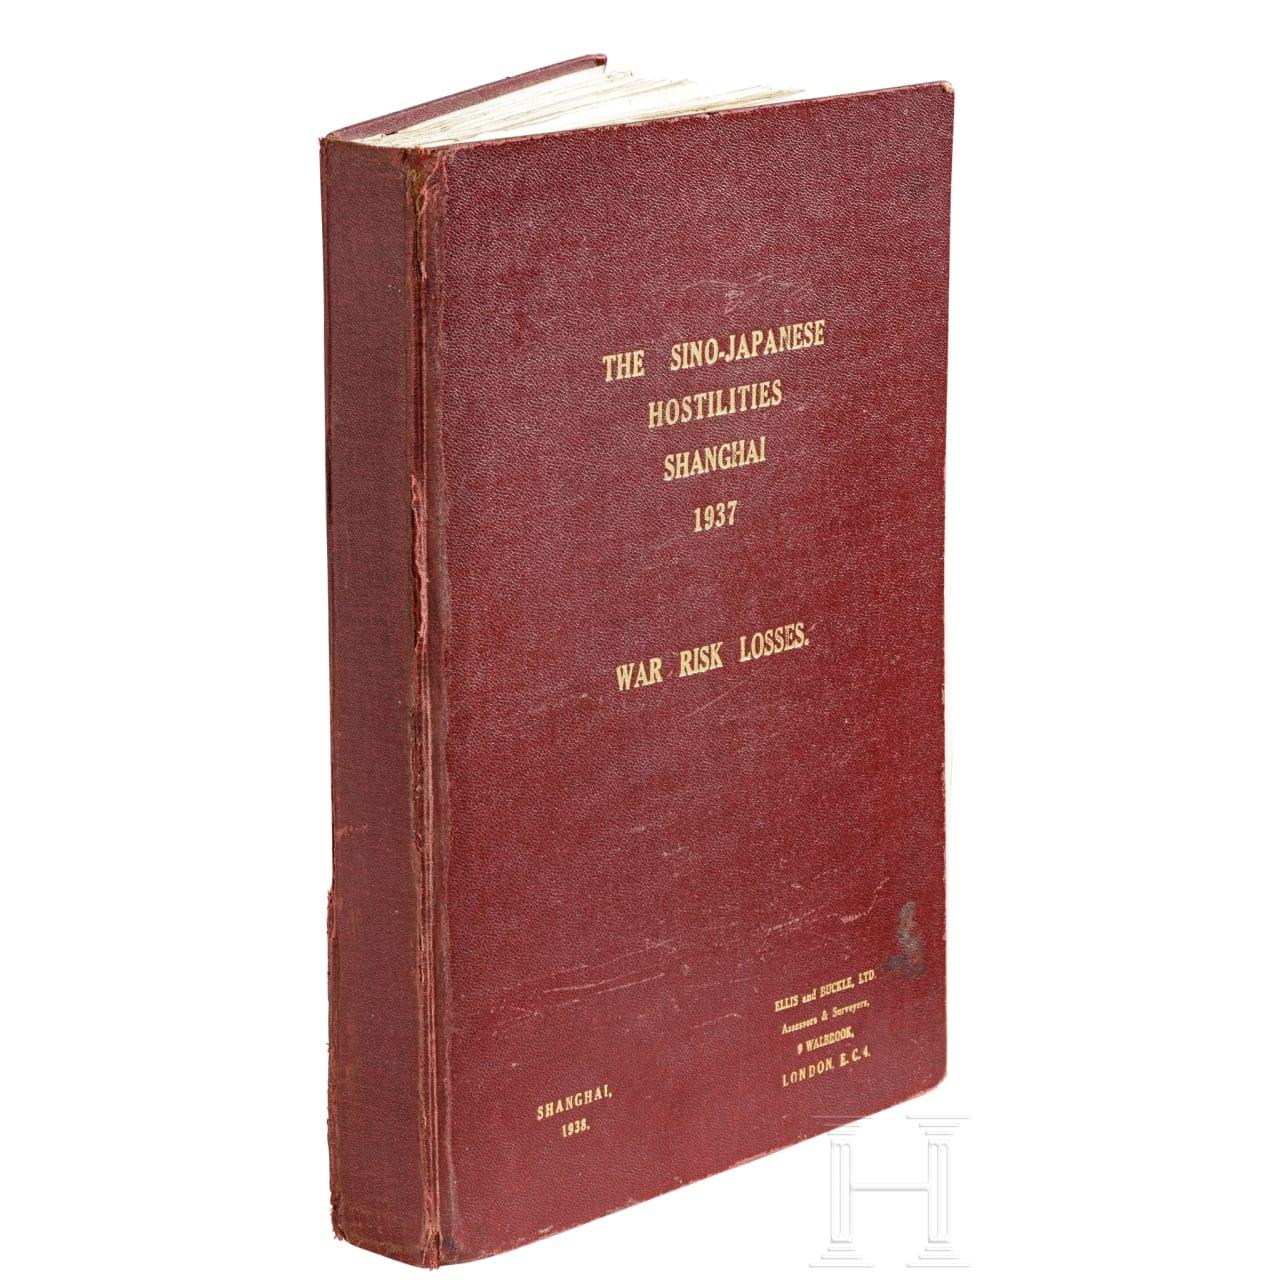 The Sino-Japanese Hostilities, Shanghai 1937: a report on war losses by ELLIS & BUCKLE Assesors & Surveyors 淞沪会战 战争损失评估报告